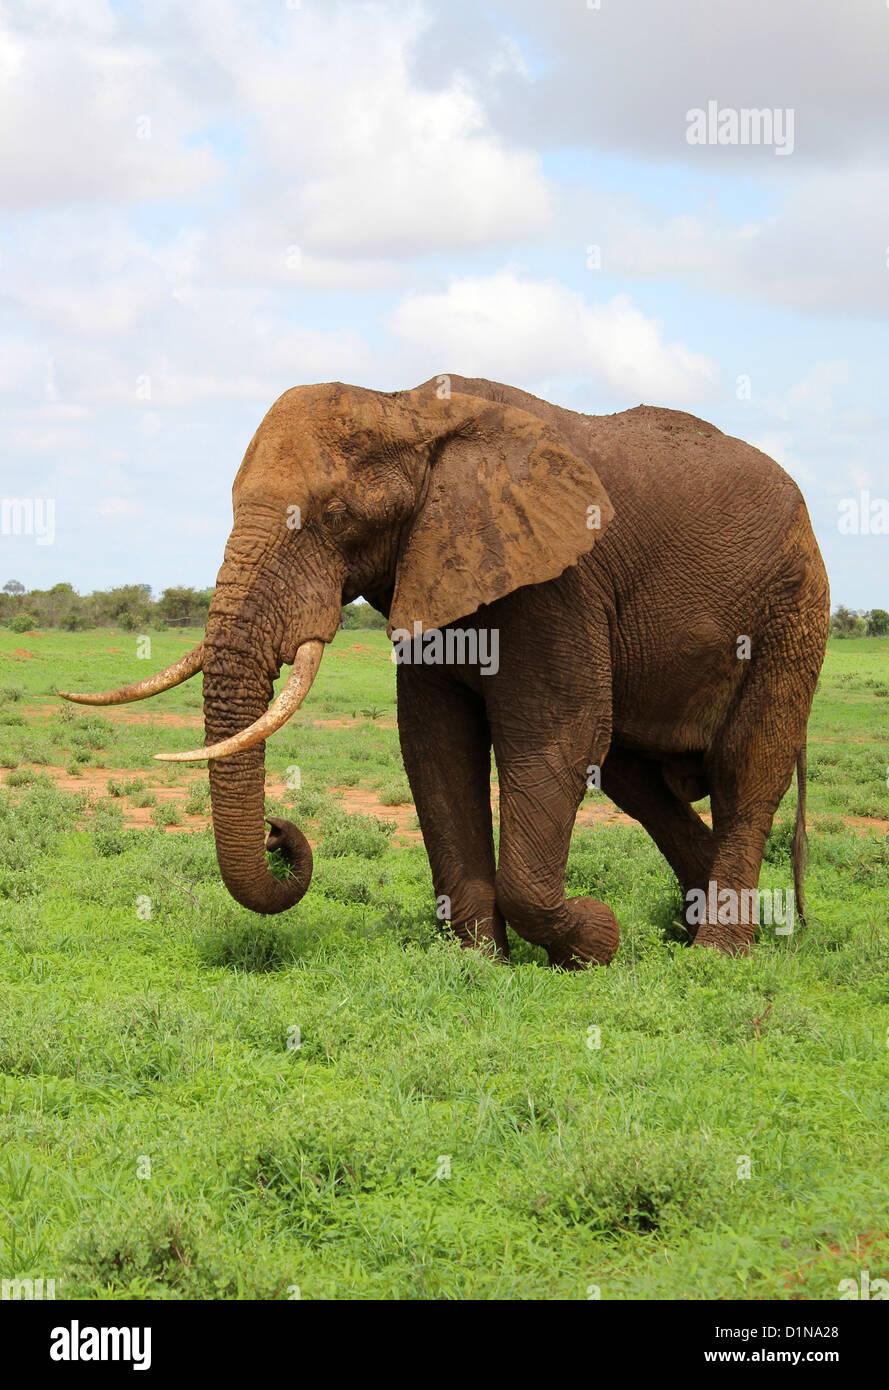 Elefanti Elefante africano, parco nazionale orientale di Tsavo, Kenya, Africa Immagini Stock